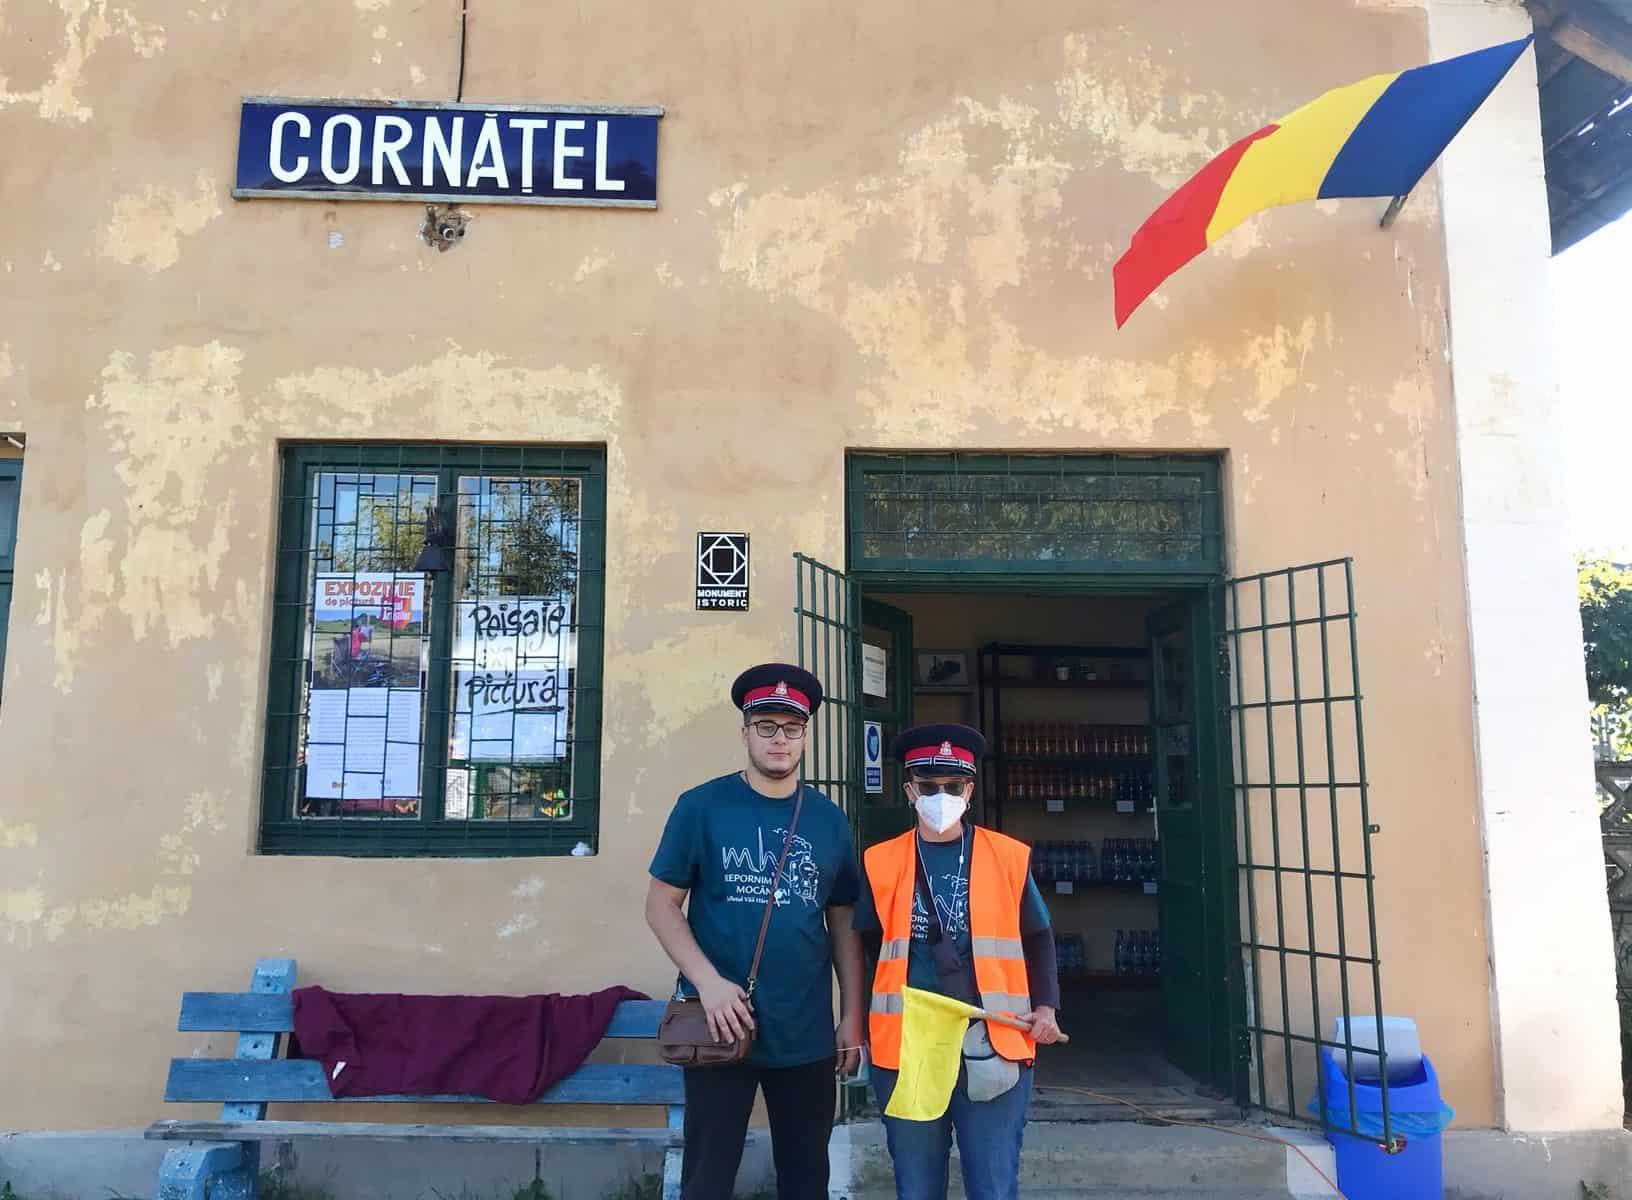 Orasul Artistilor expozitie Cornatel